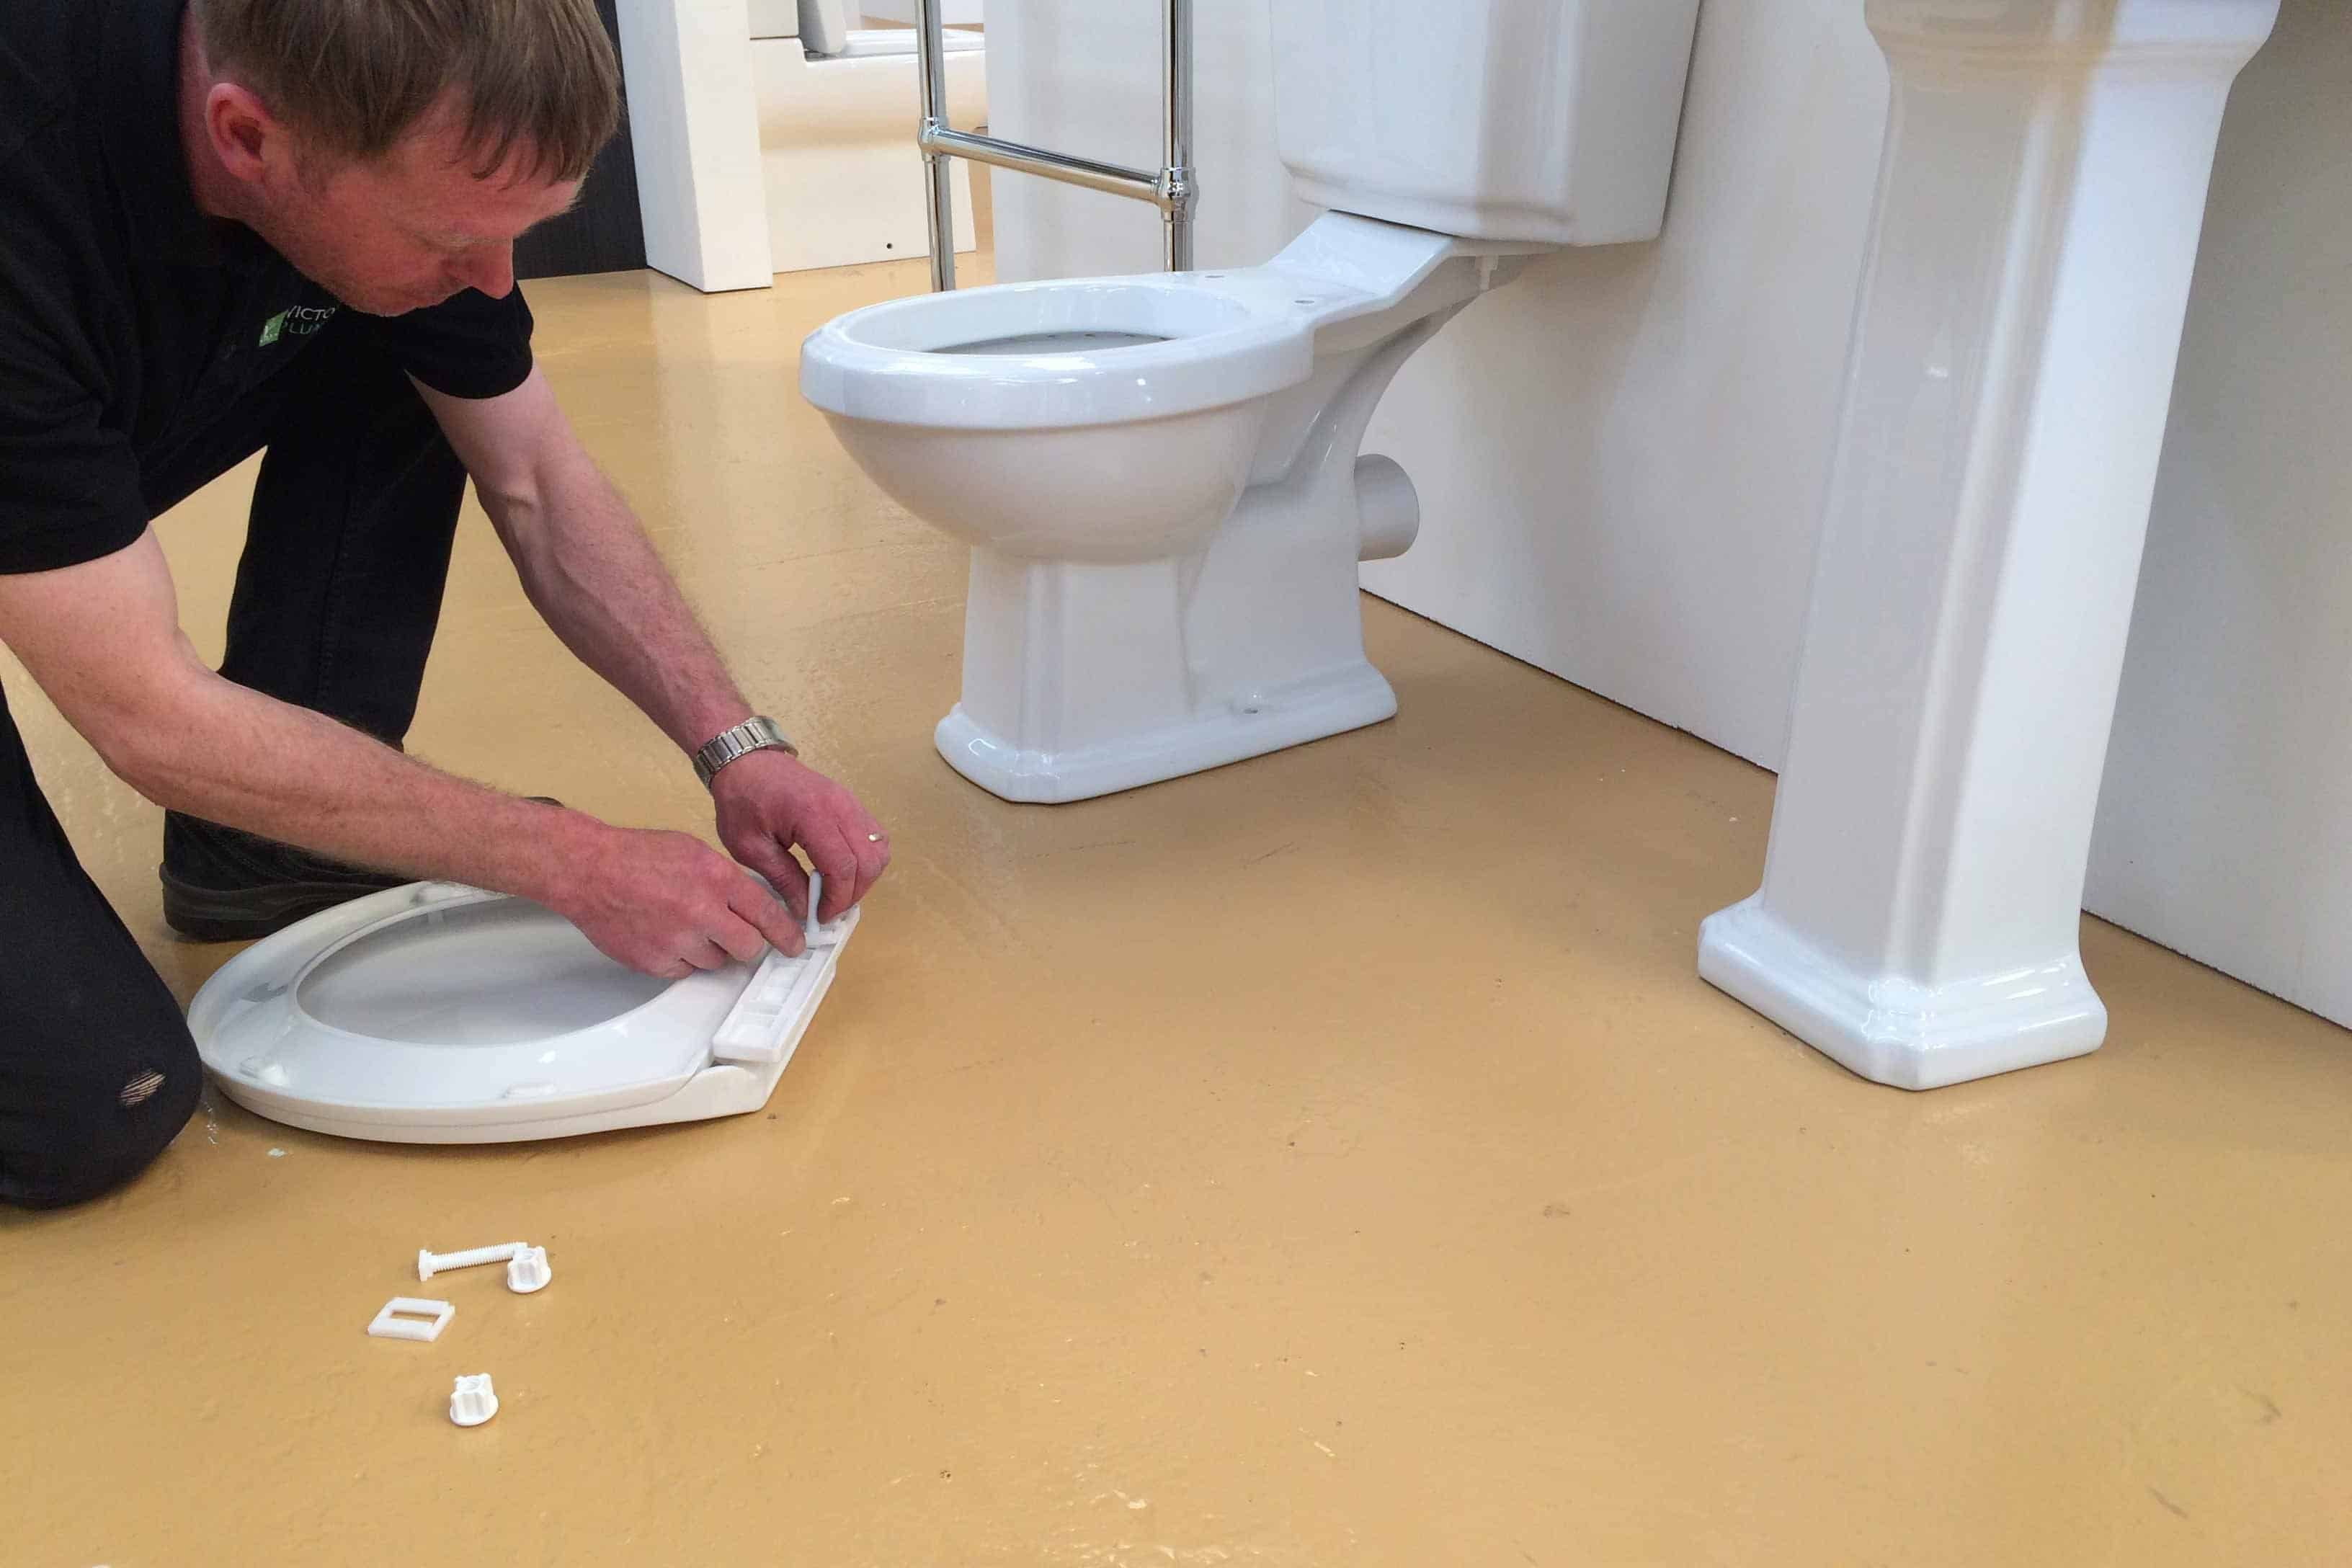 Toilet Seat fitting